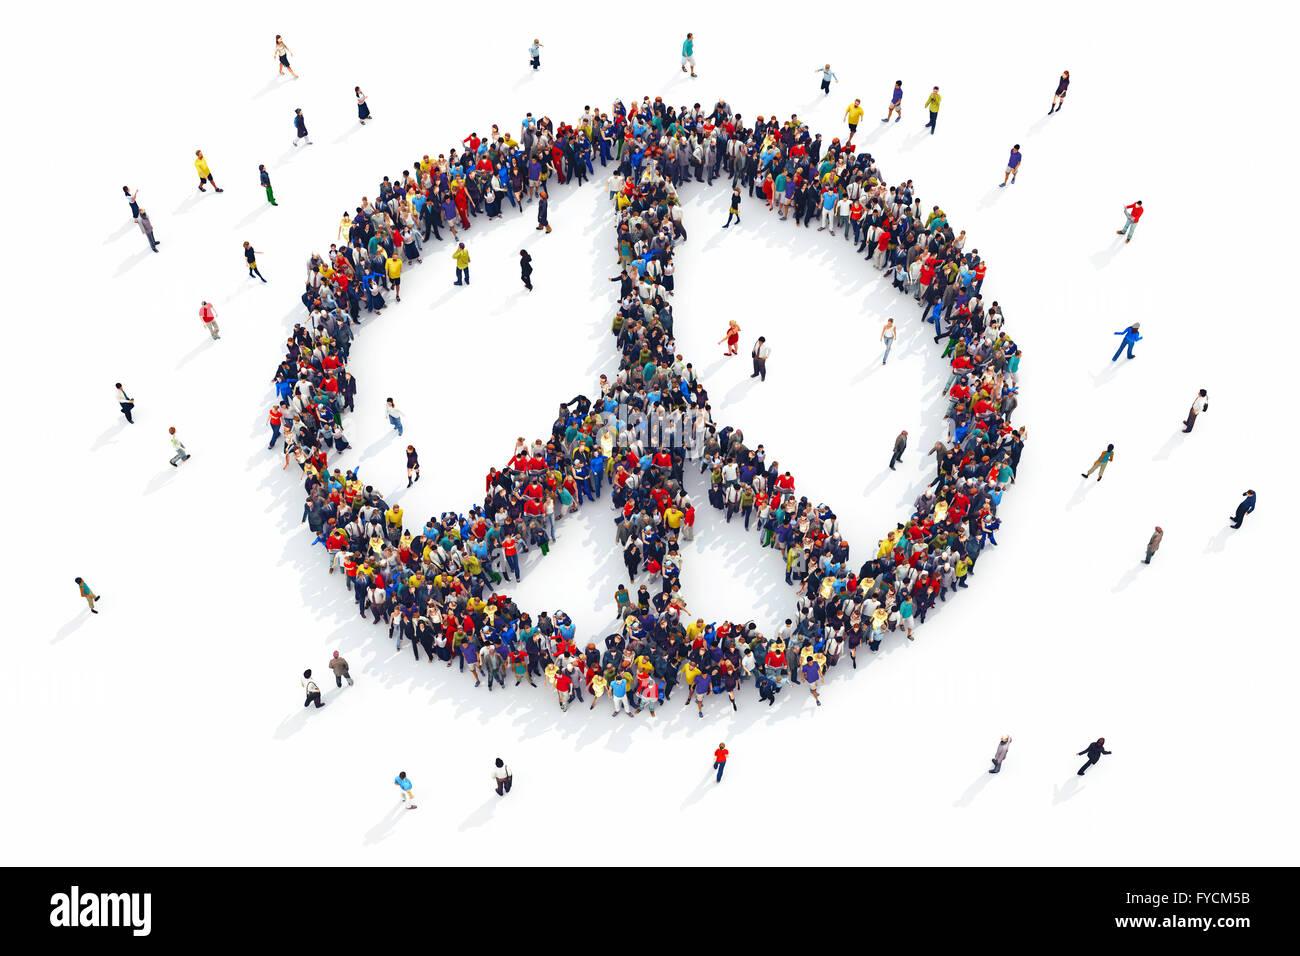 3D-Rendering des Menschen zum Frieden Stockbild